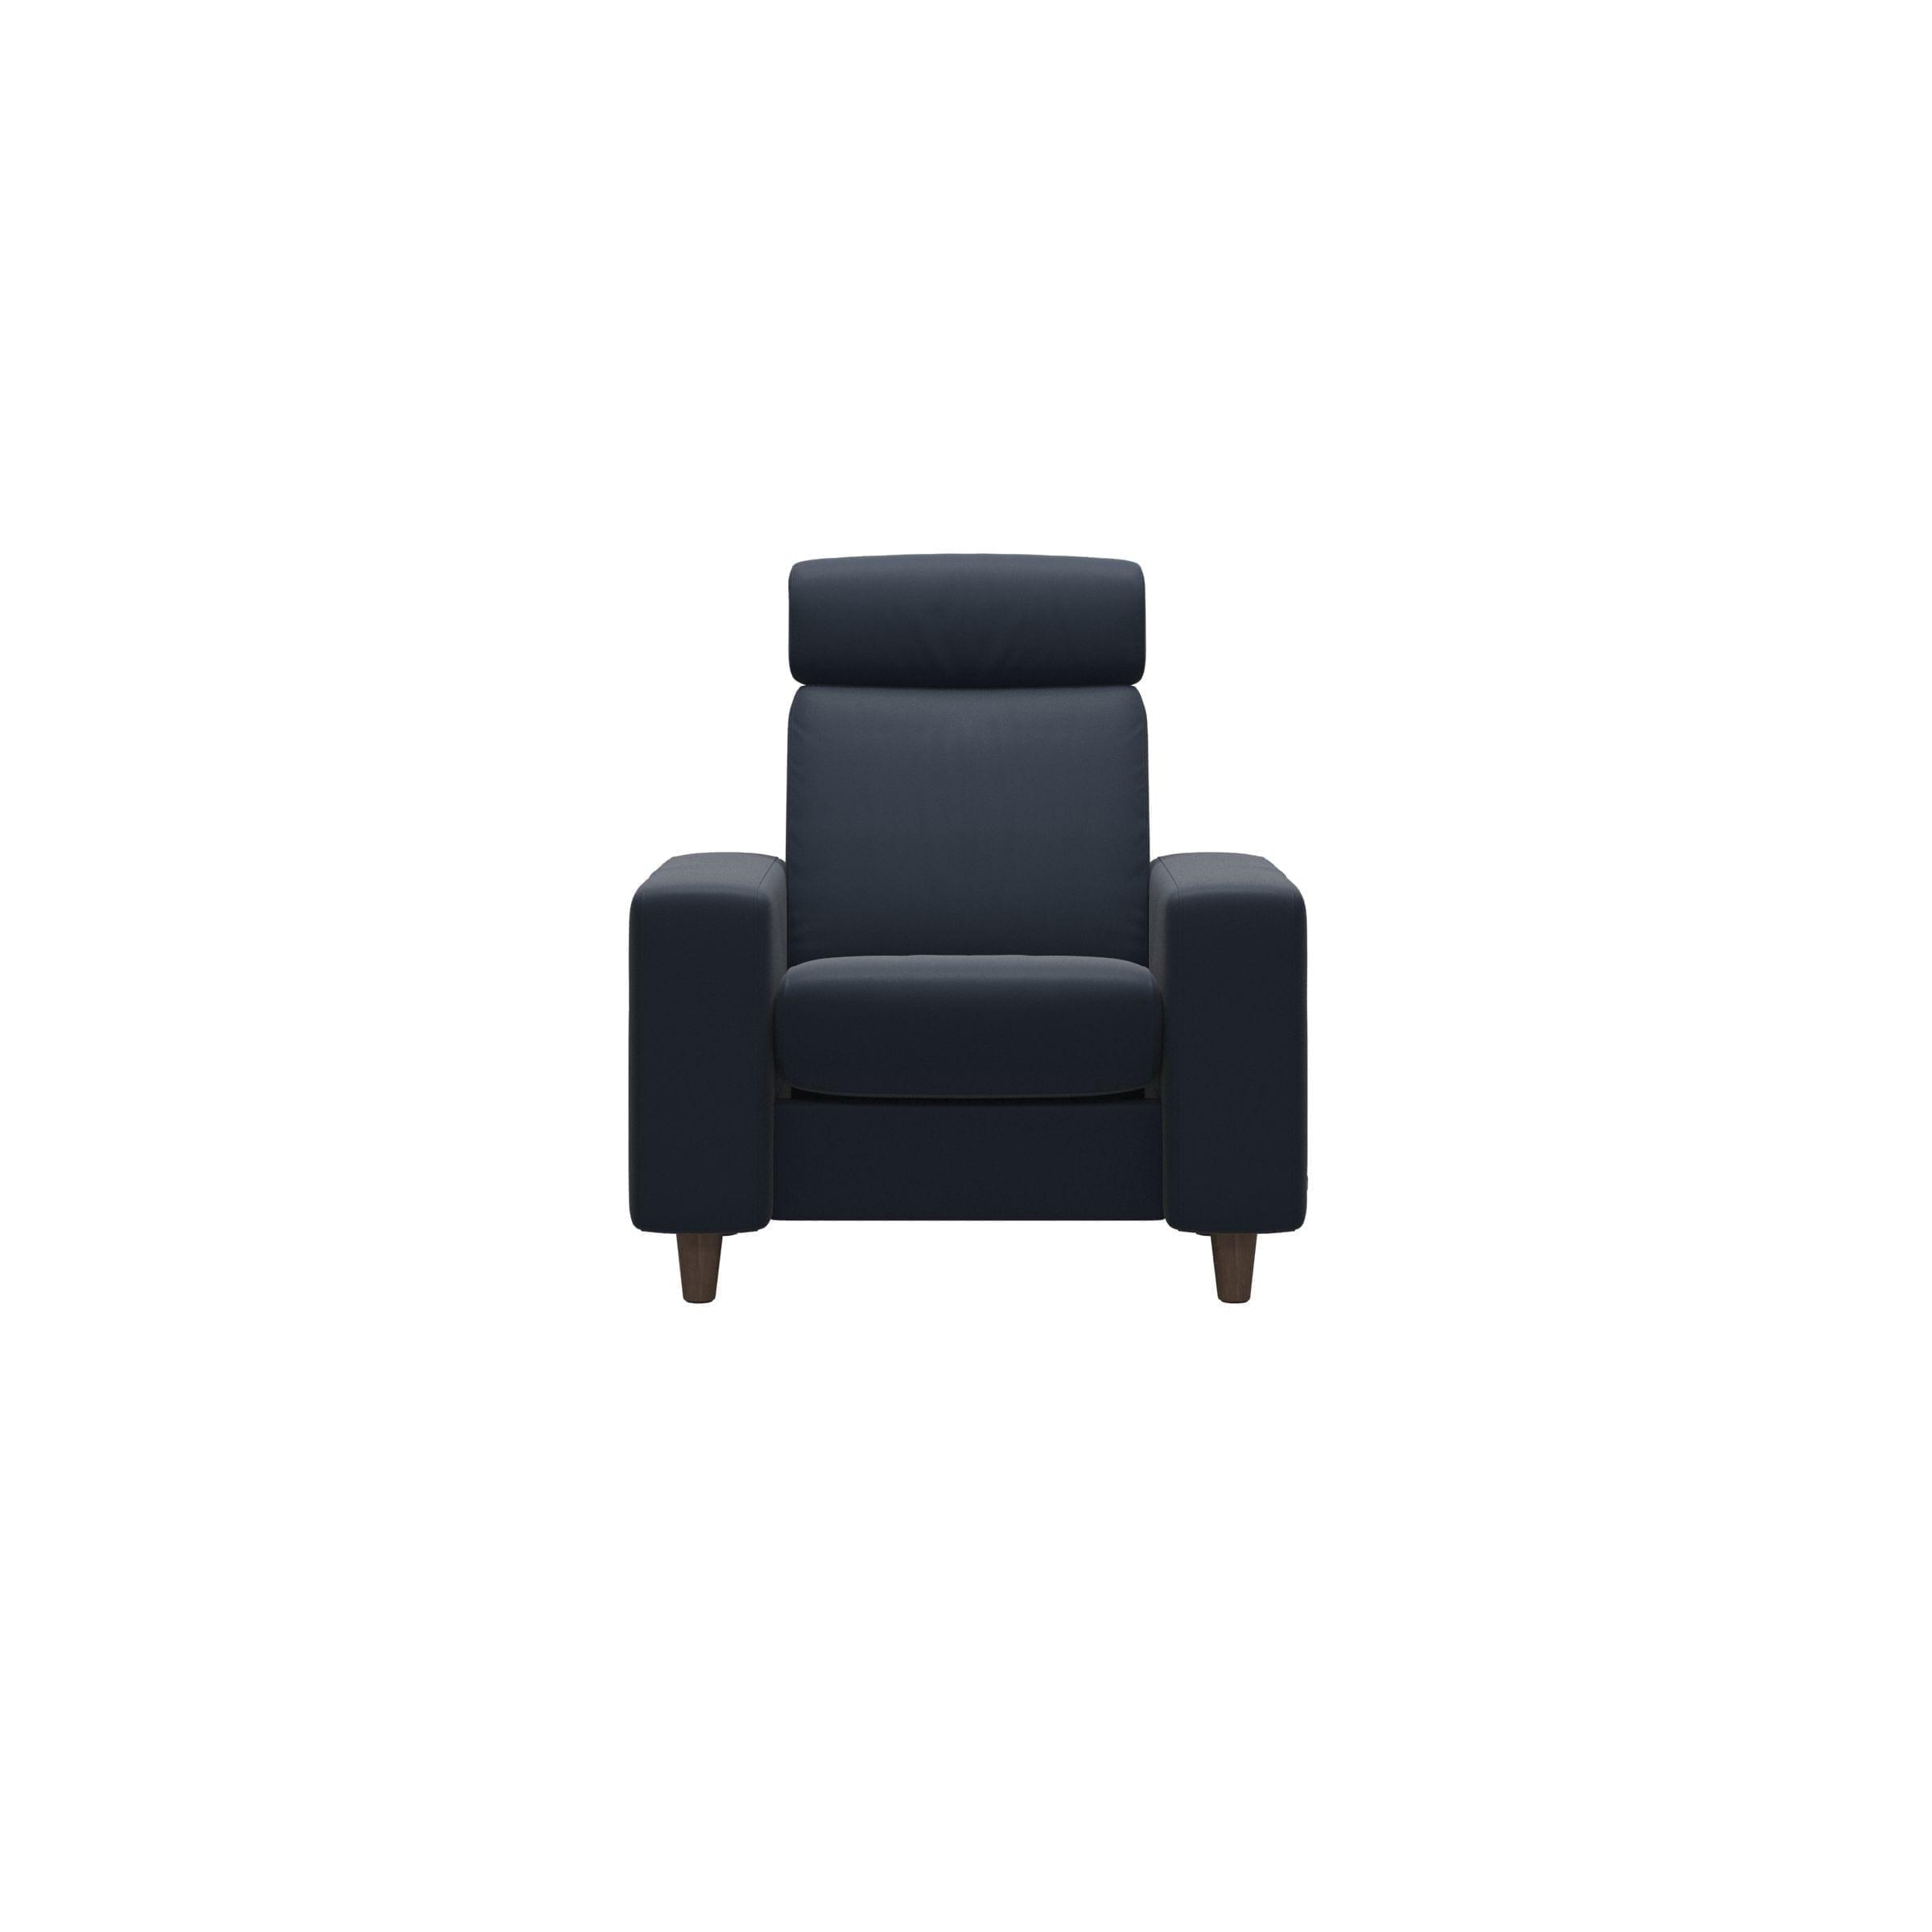 Arion 19 A20 Stressless High Back Chair